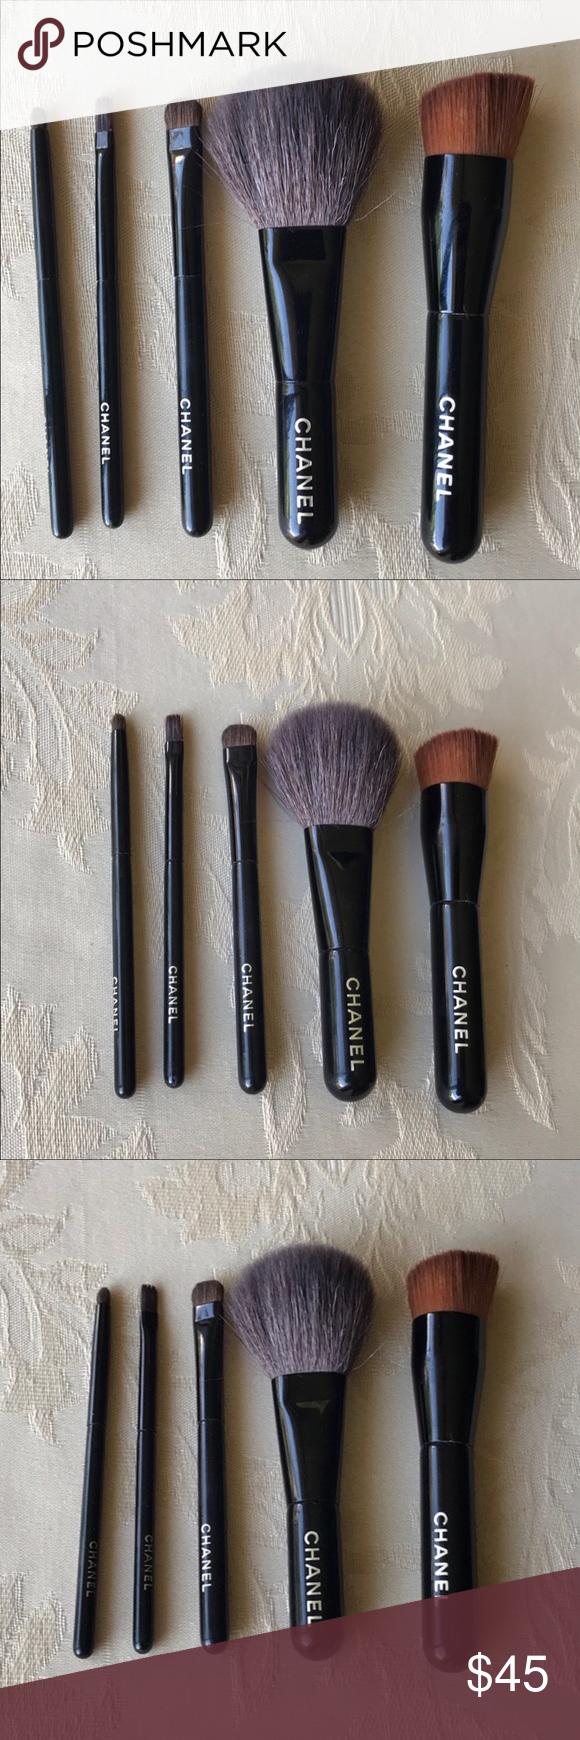 Chanel makeup brush set Authentic, Chanel travel brush set